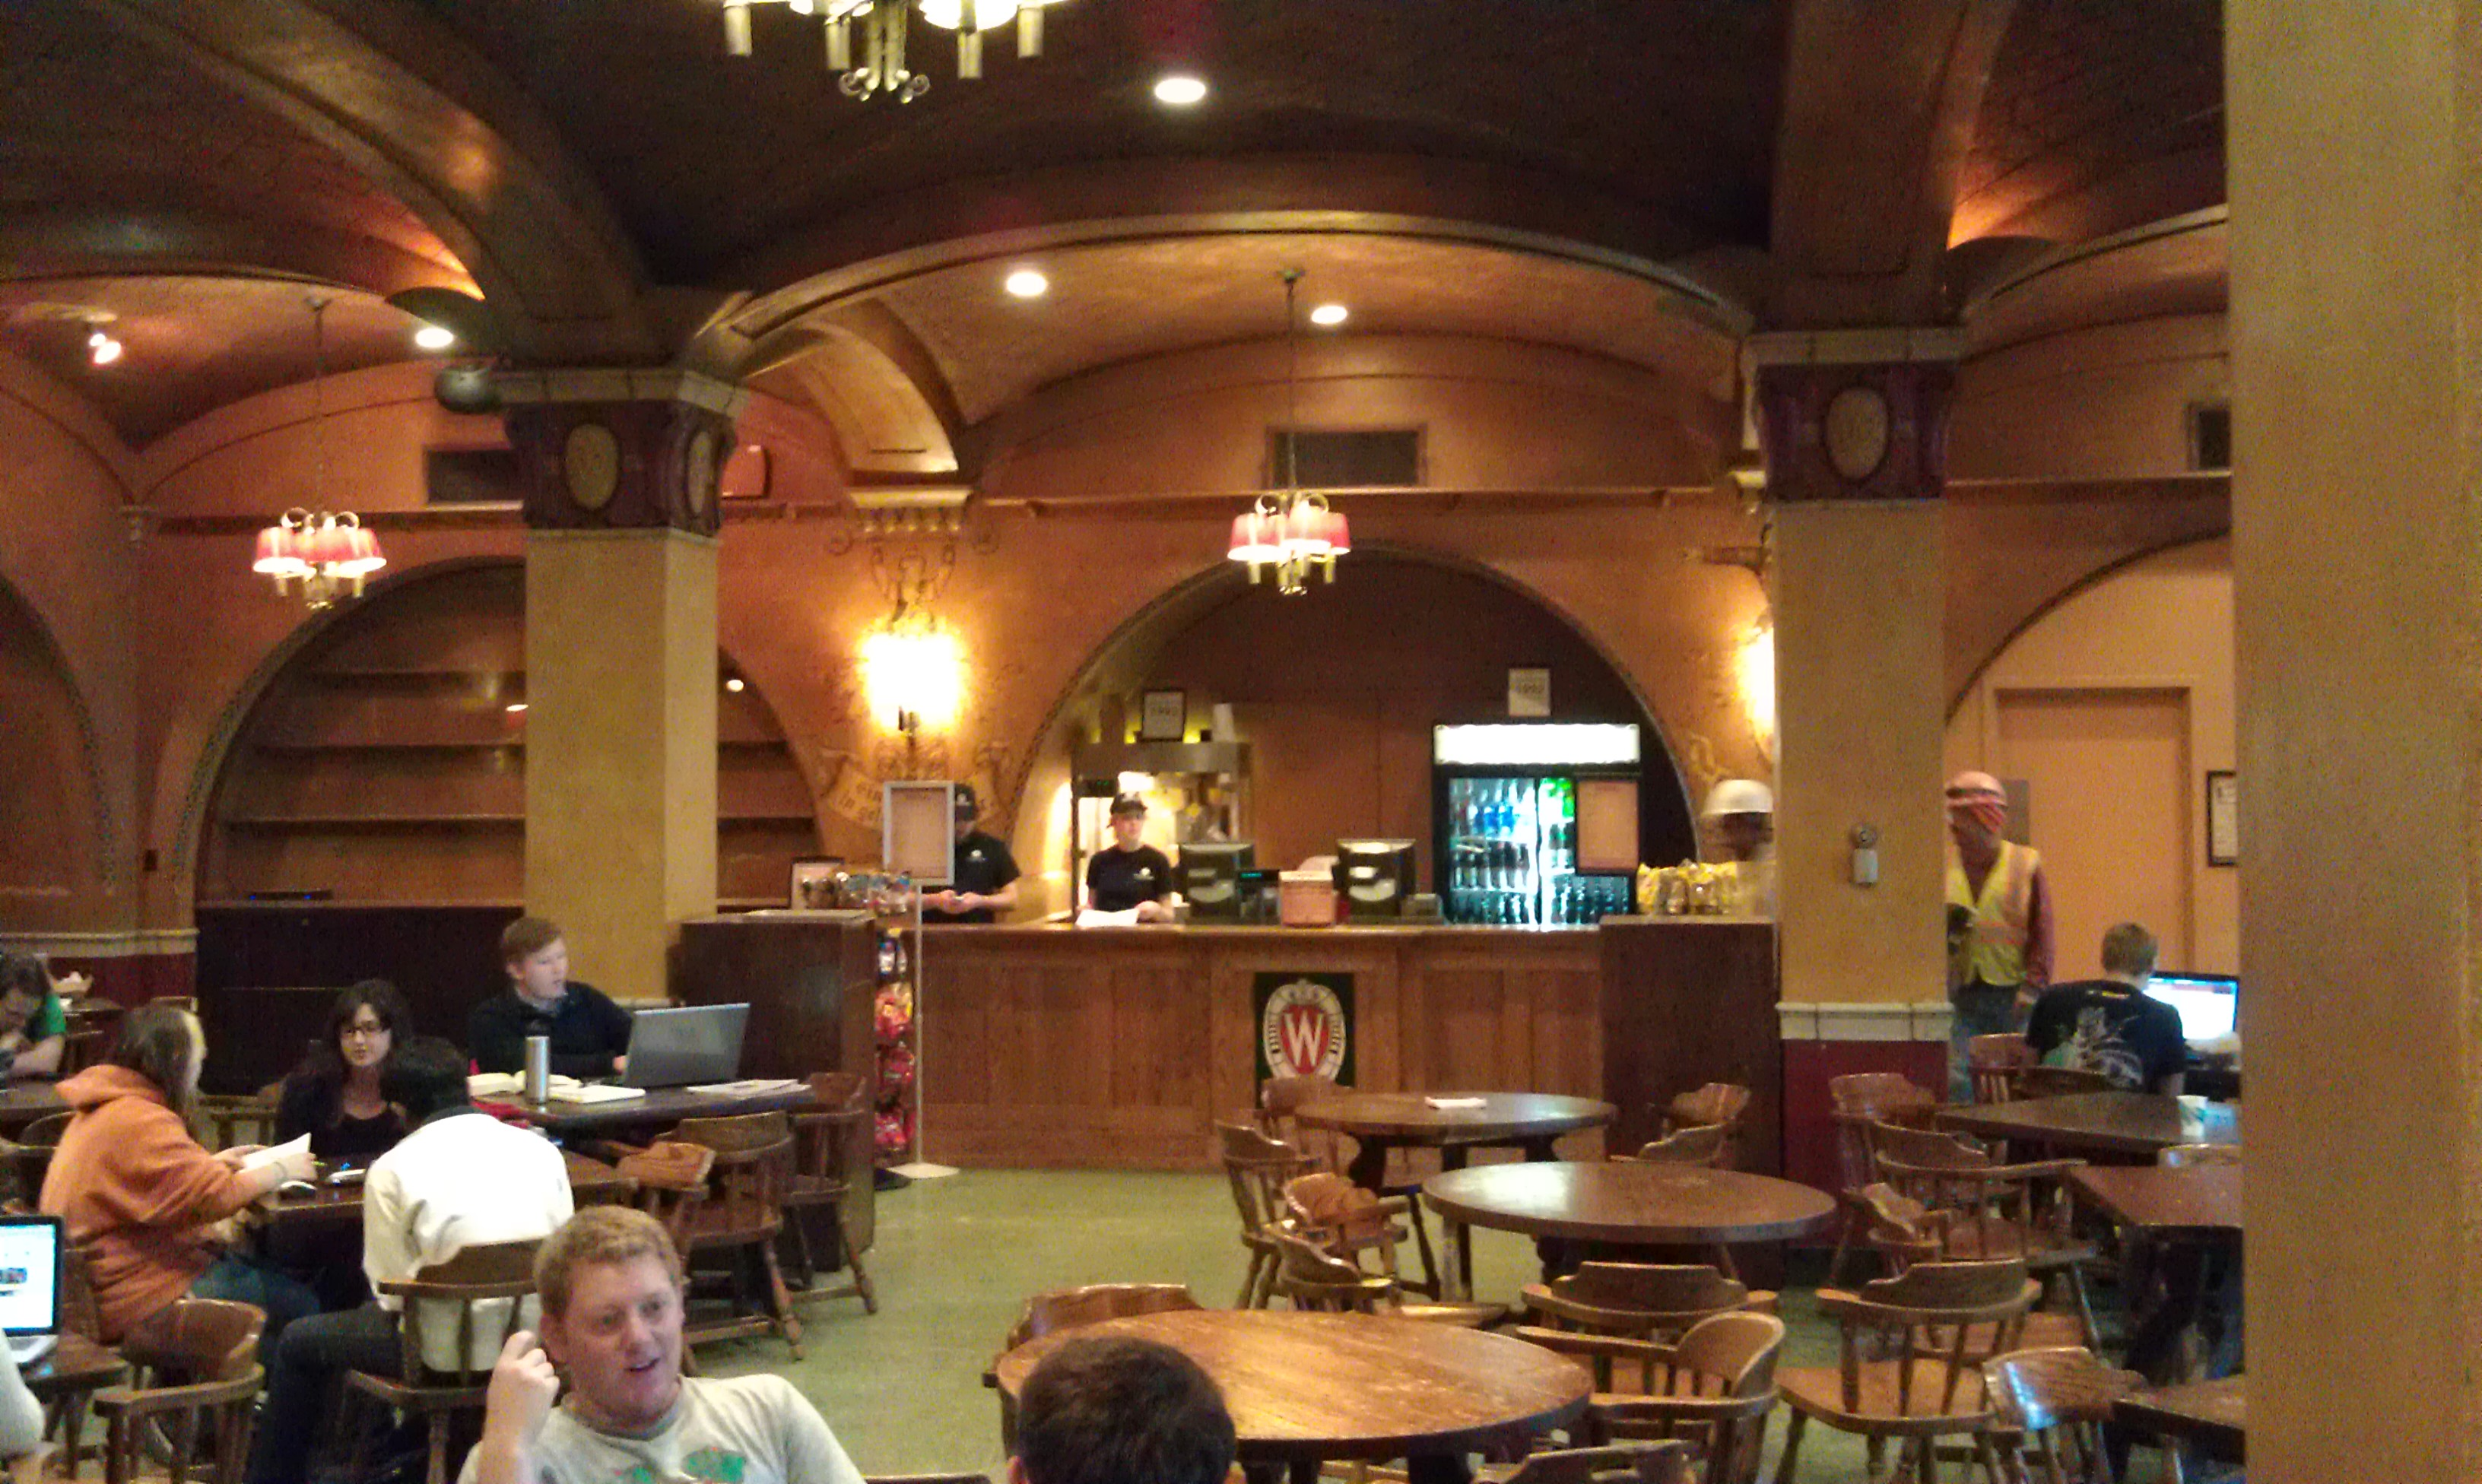 Temporary Rathskeller bar now open